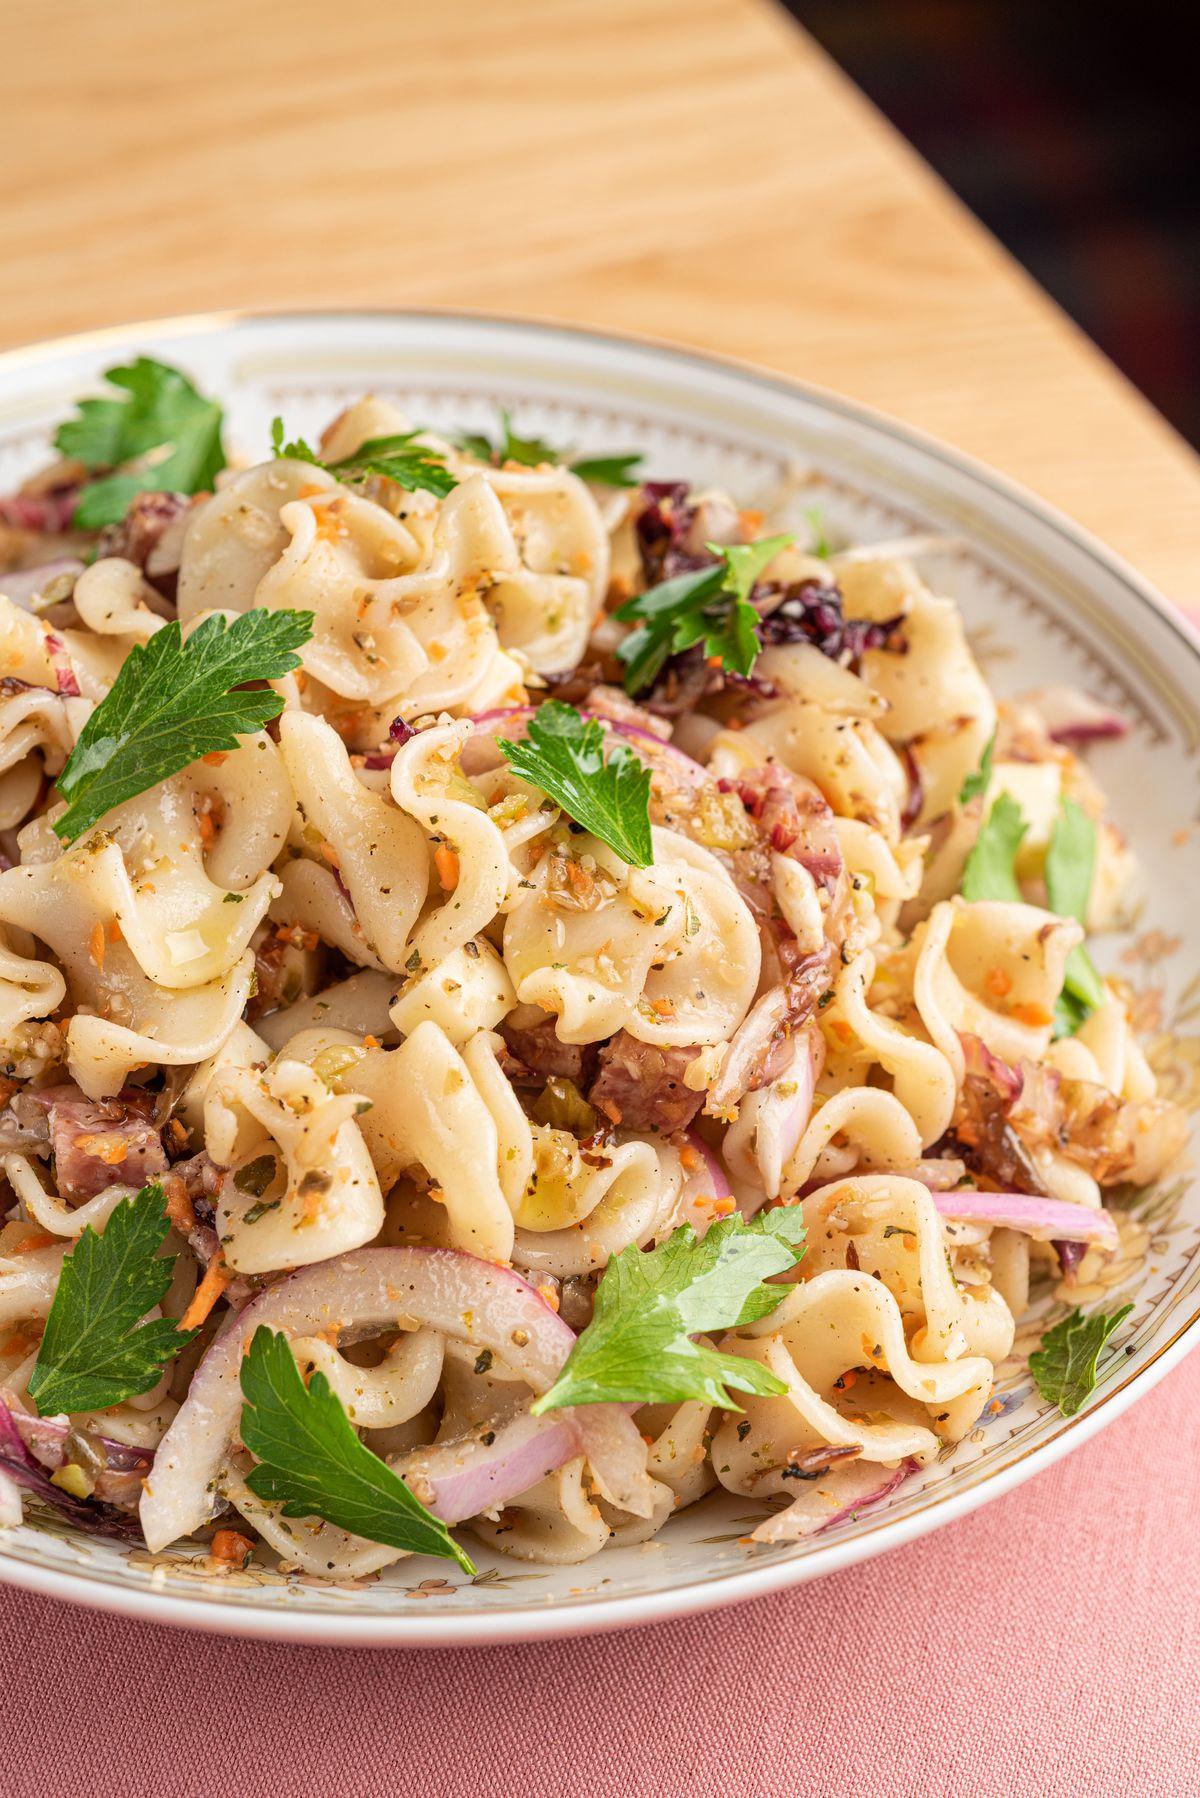 A bowl of pasta with Italian seasonings, onions, and mozzarella.